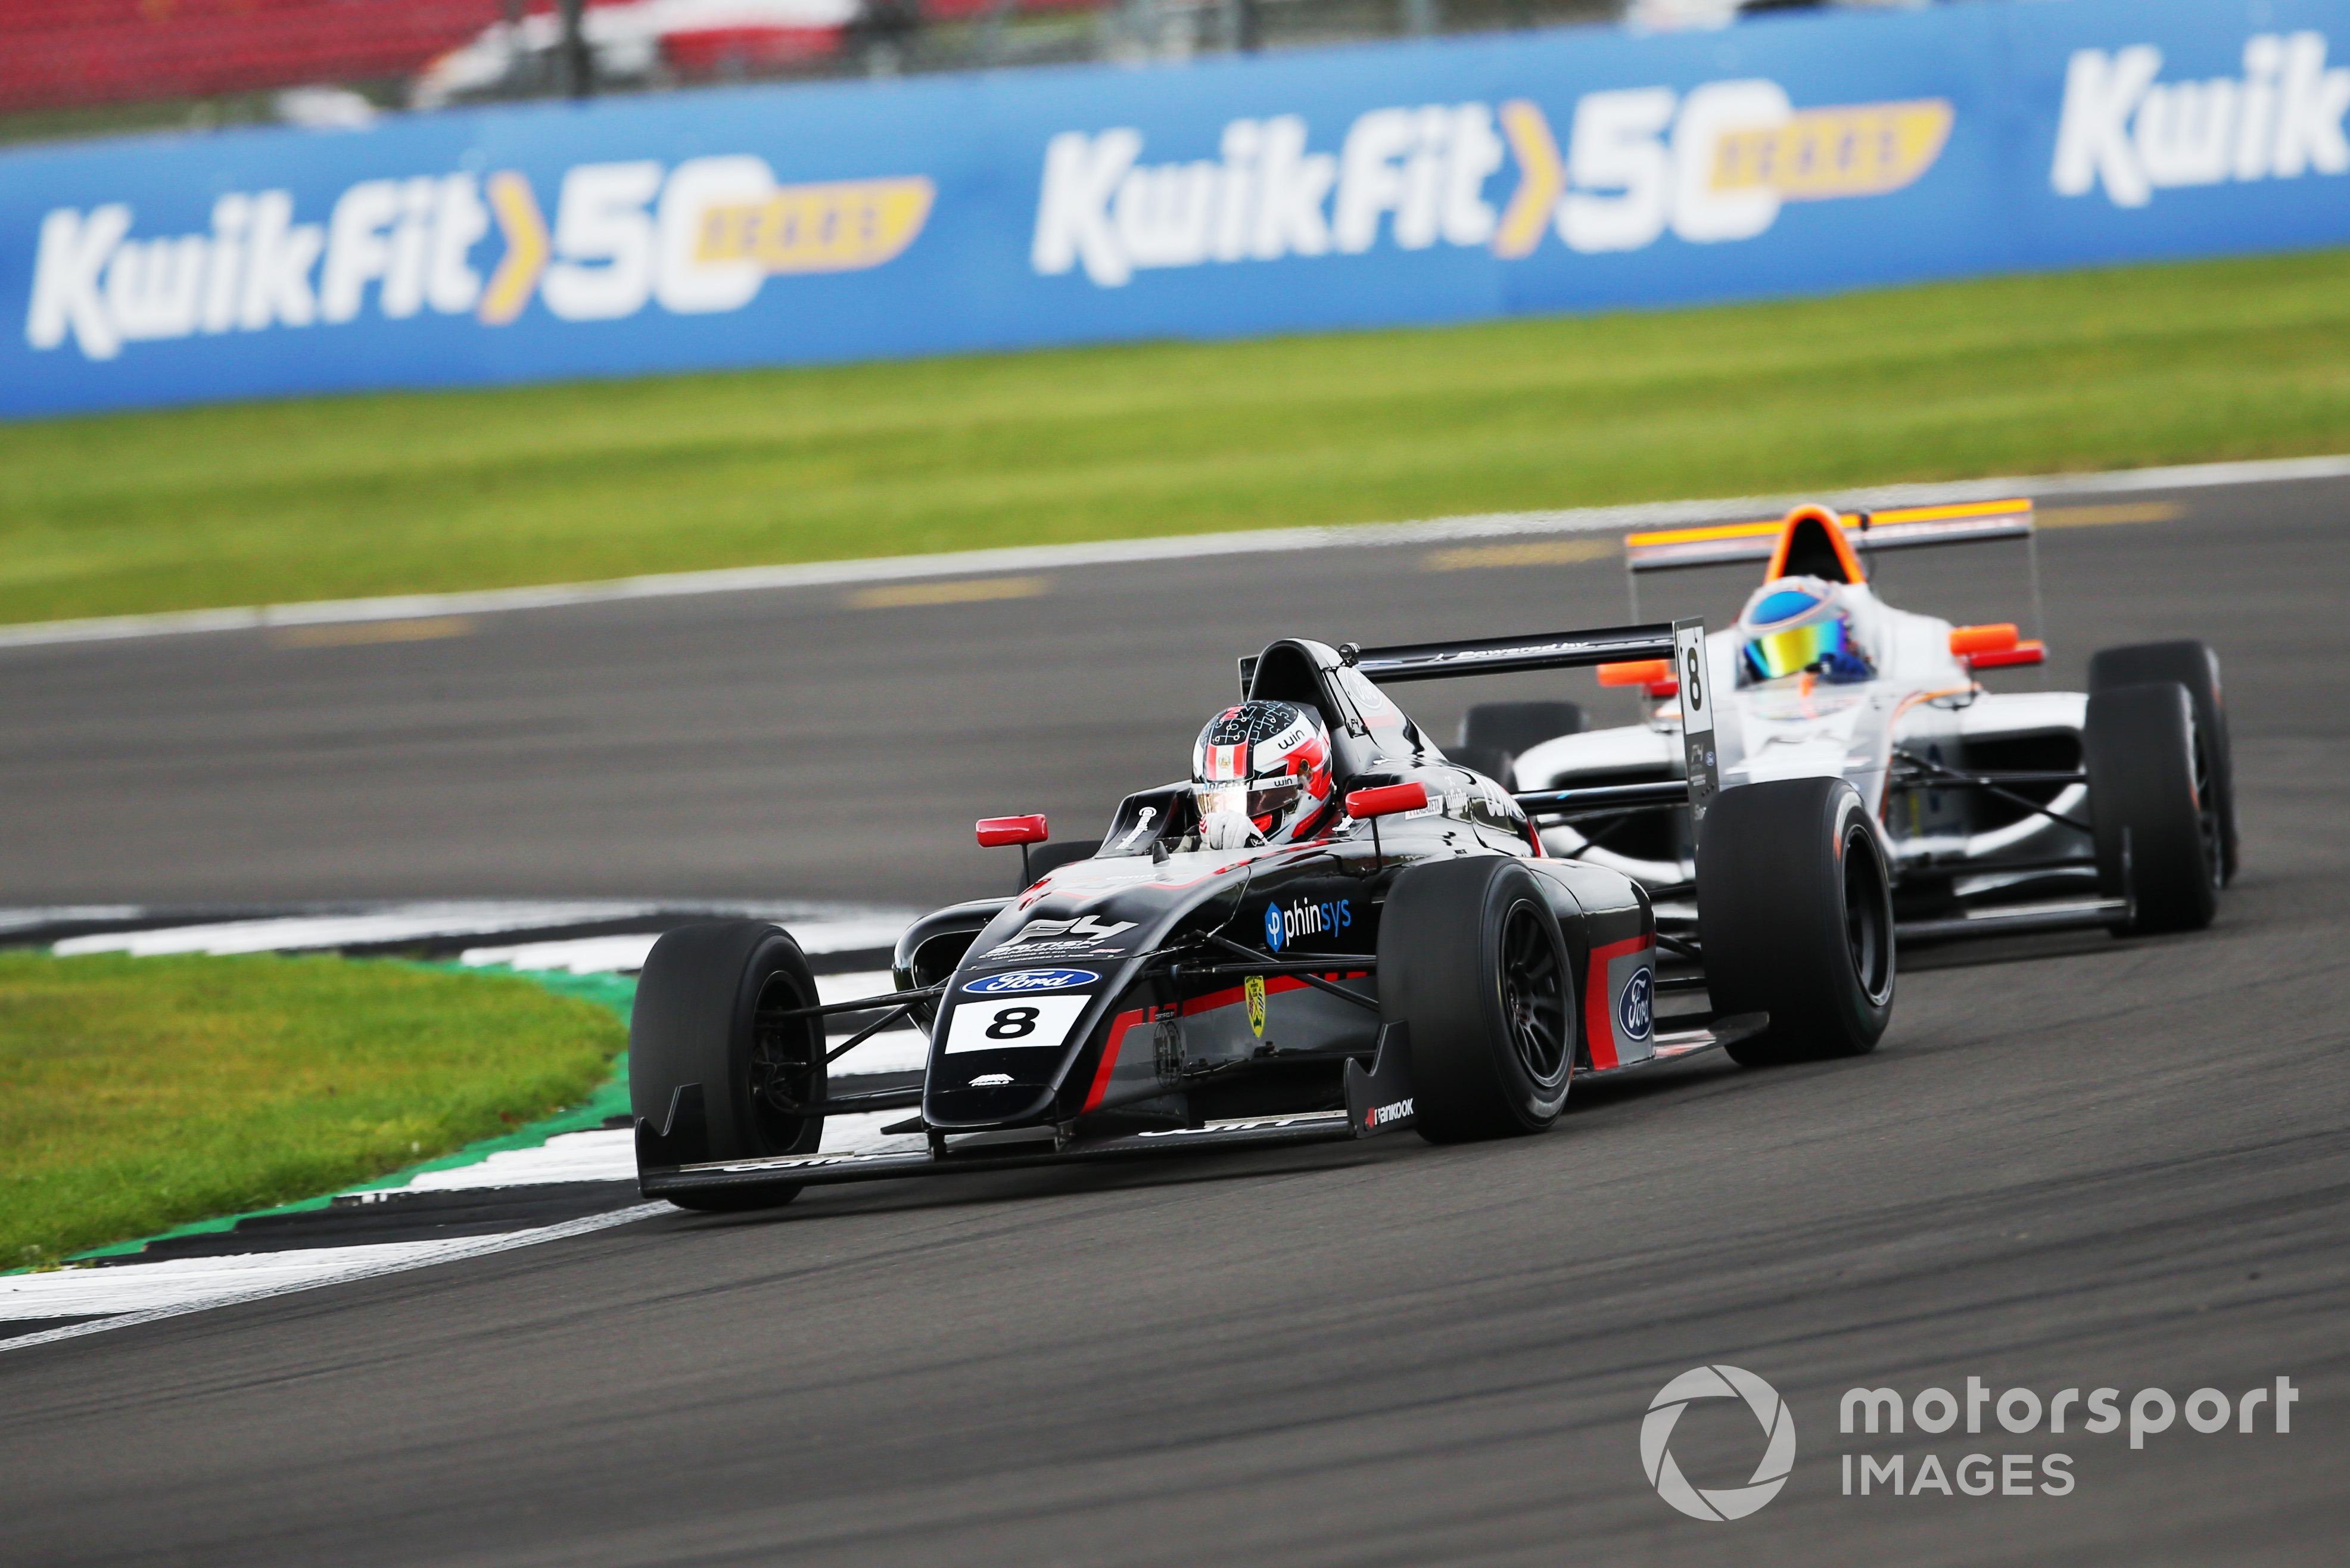 Matias Zagazeta, British F4, Silverstone 2021